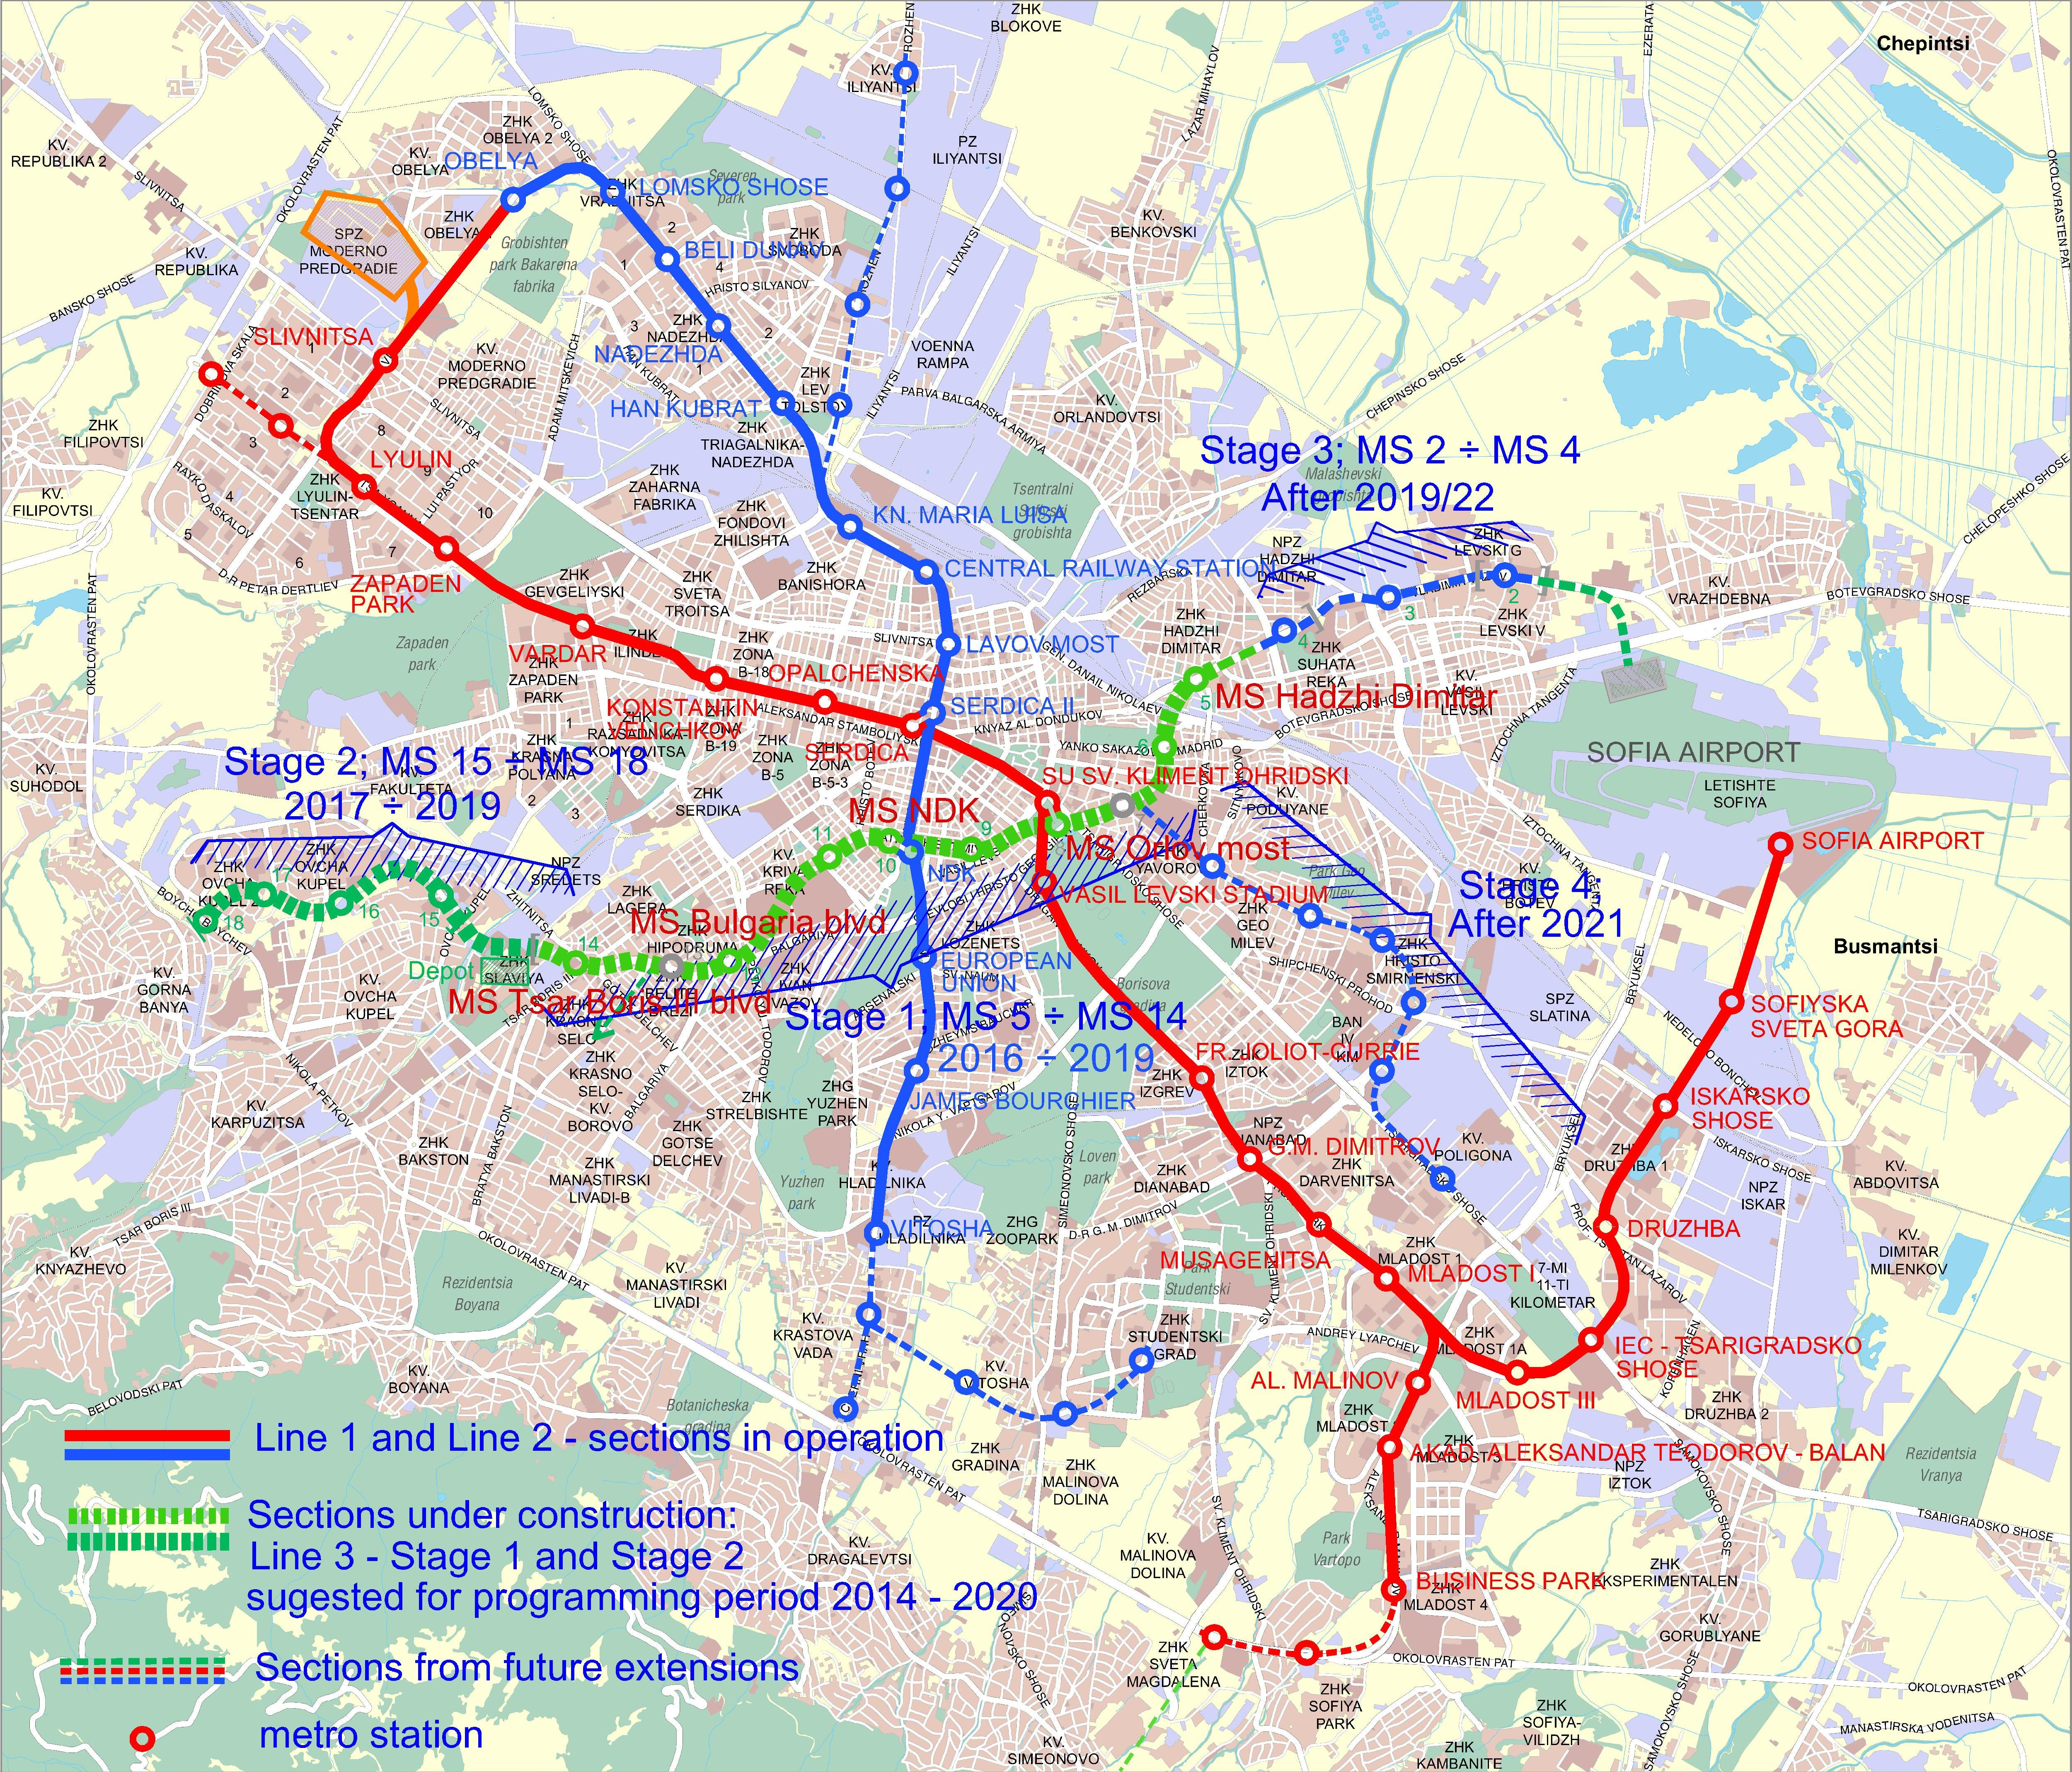 Sofia Subway Map.General Scheme Metropolitan Sofia